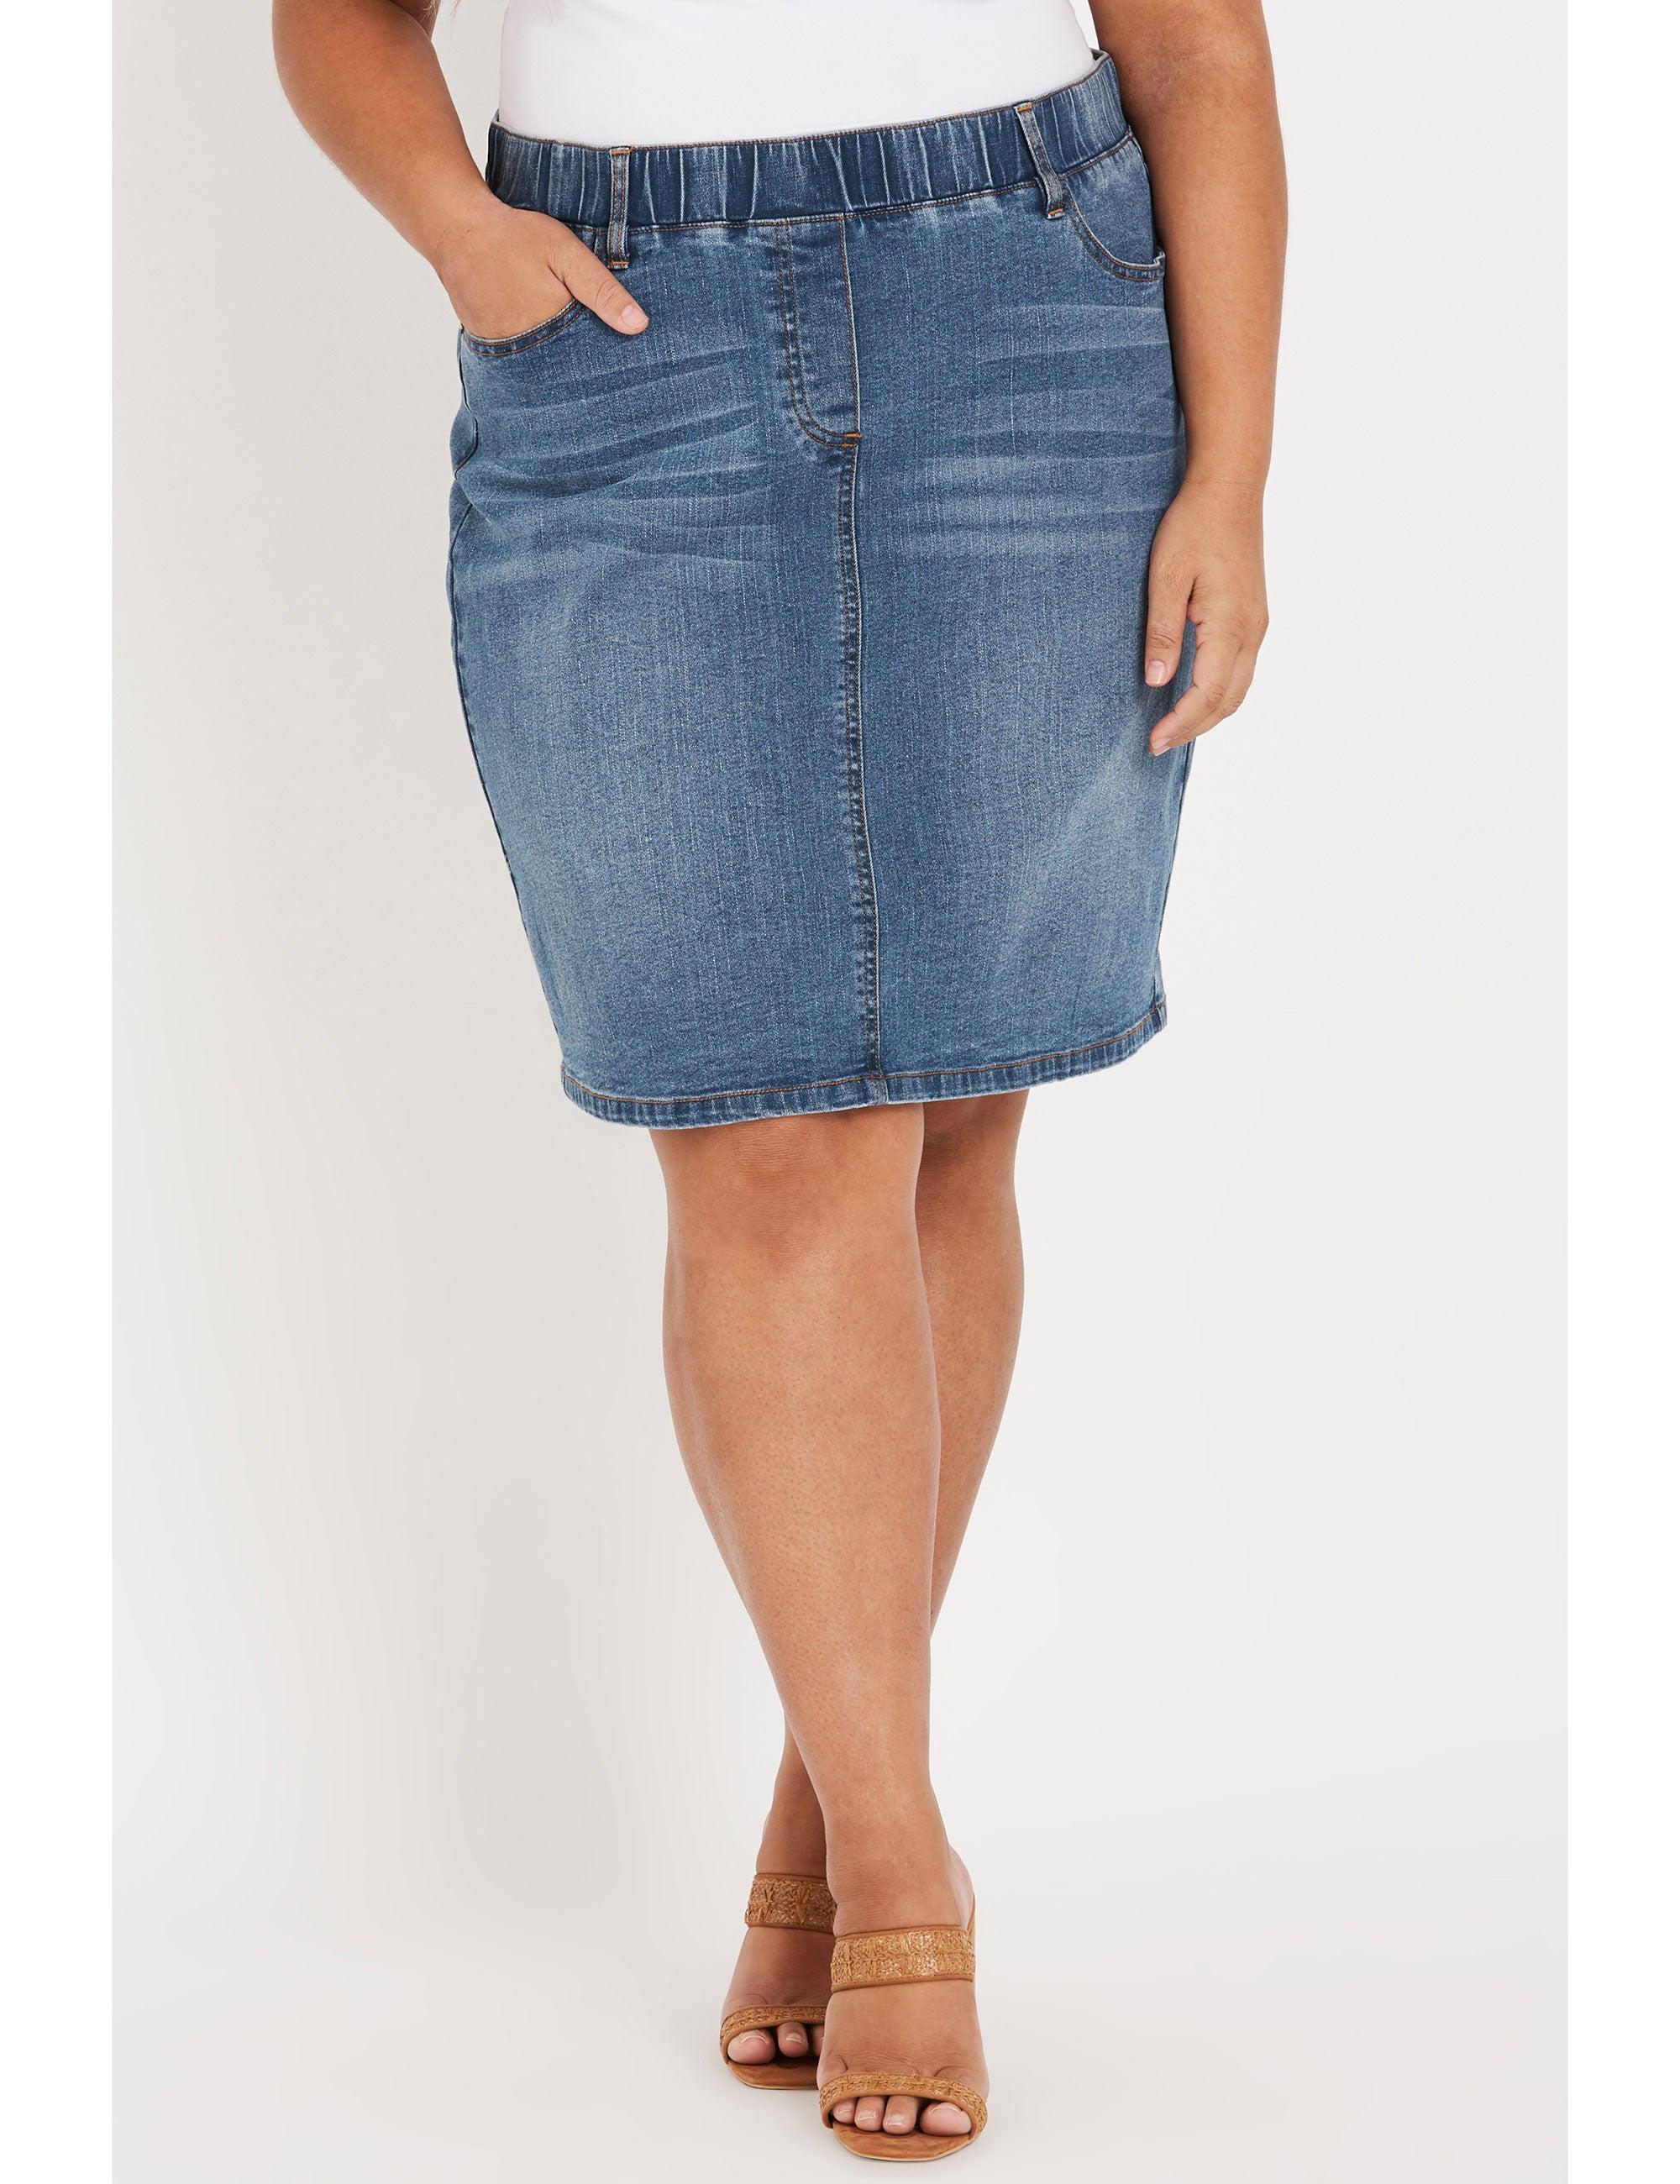 Plus Size Denim Skirts   Womens Skirt Sizes 8 28   Simply Be USA